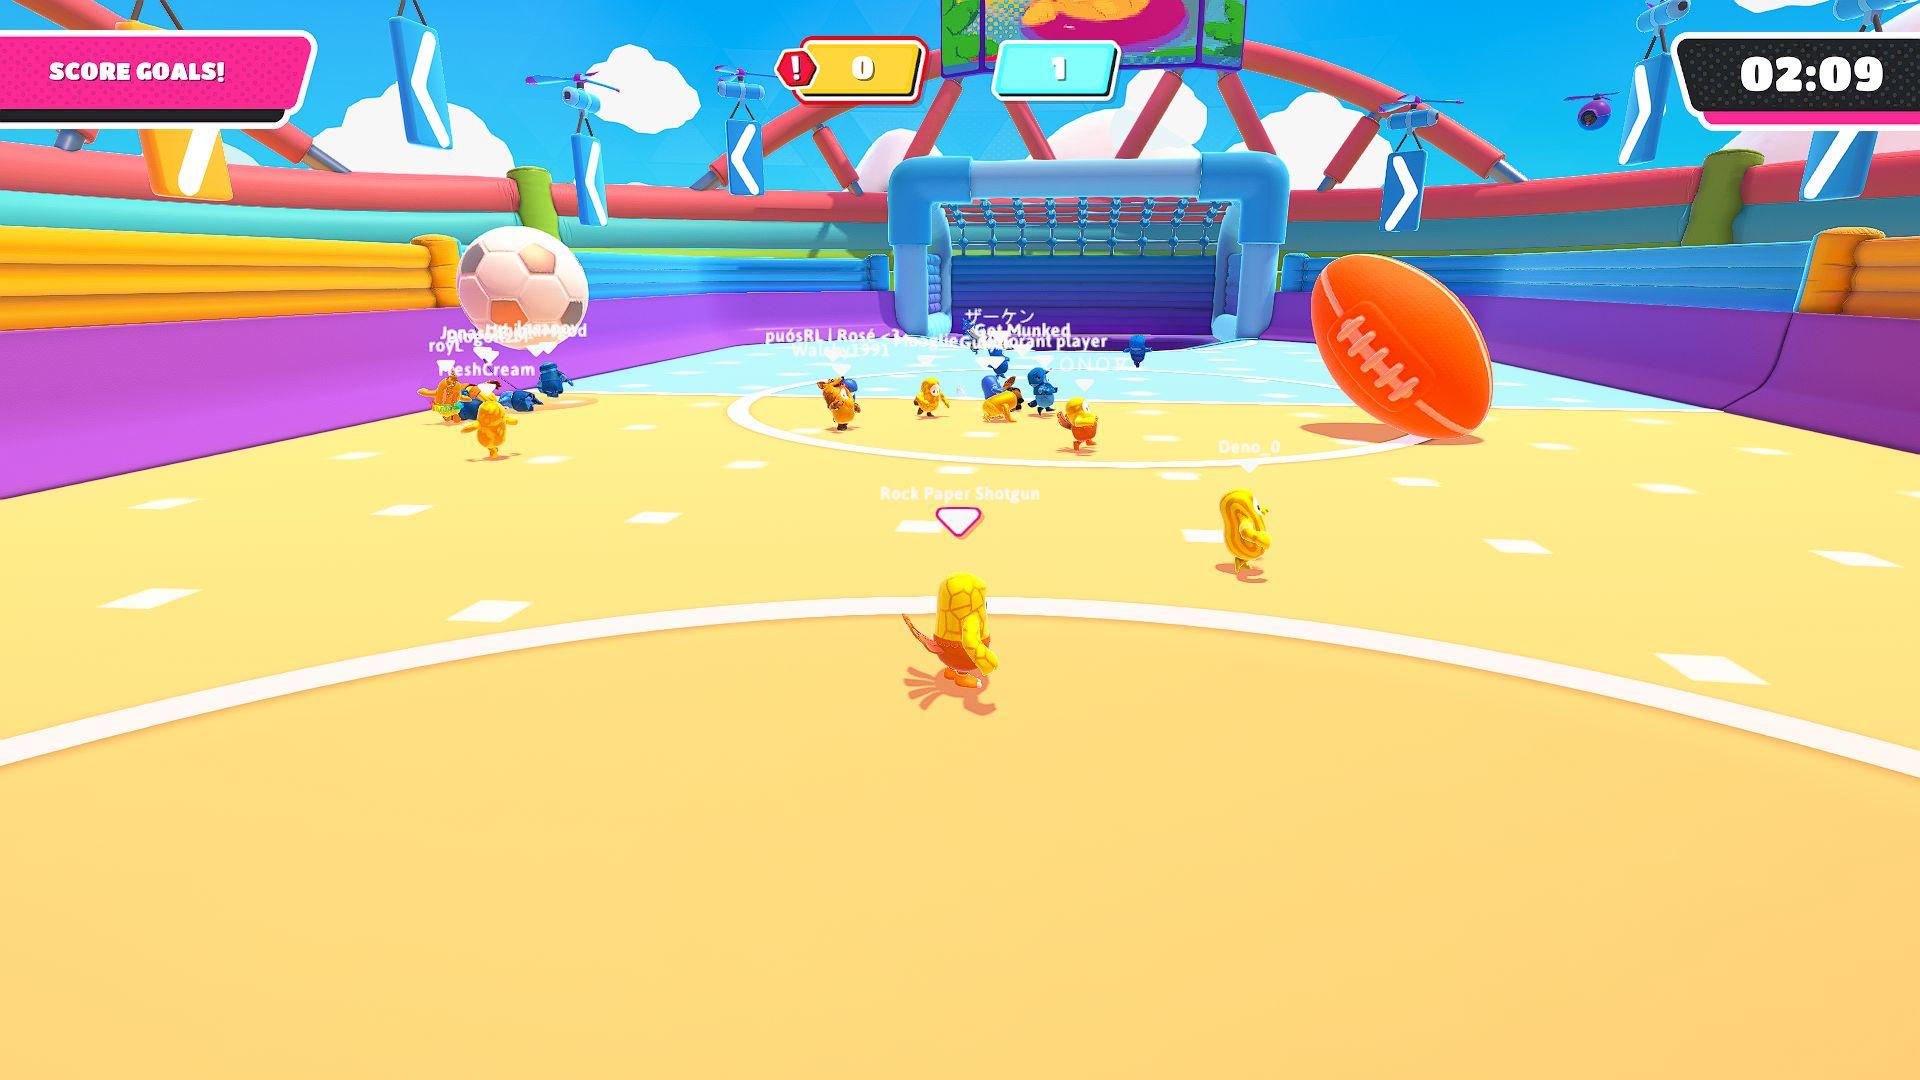 Captura de pantalla de Fall Guys donde una pelota de fútbol y una pelota de fútbol americano rebotan de manera incongruente alrededor de un campo